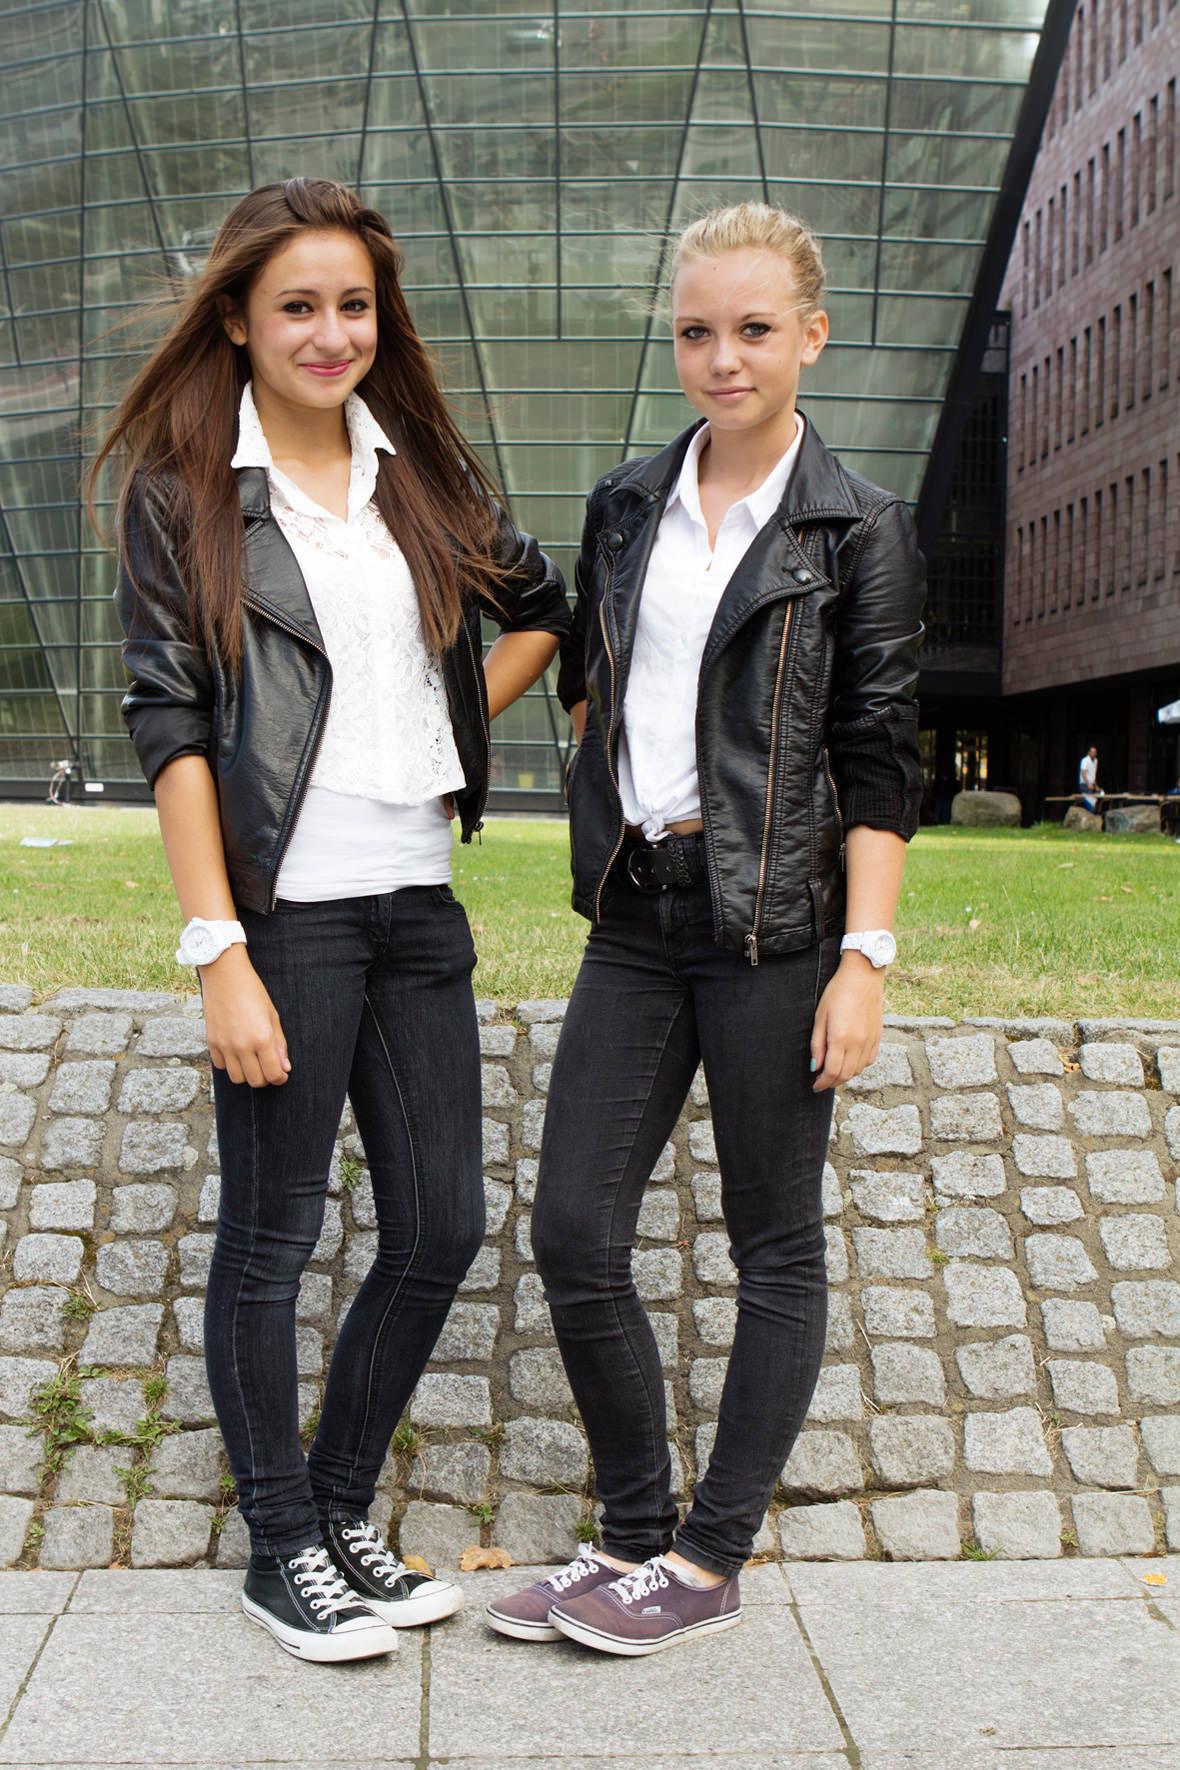 Nevin_Aladag_2012_Best-Friends-Dortmund_01.jpg#asset:733